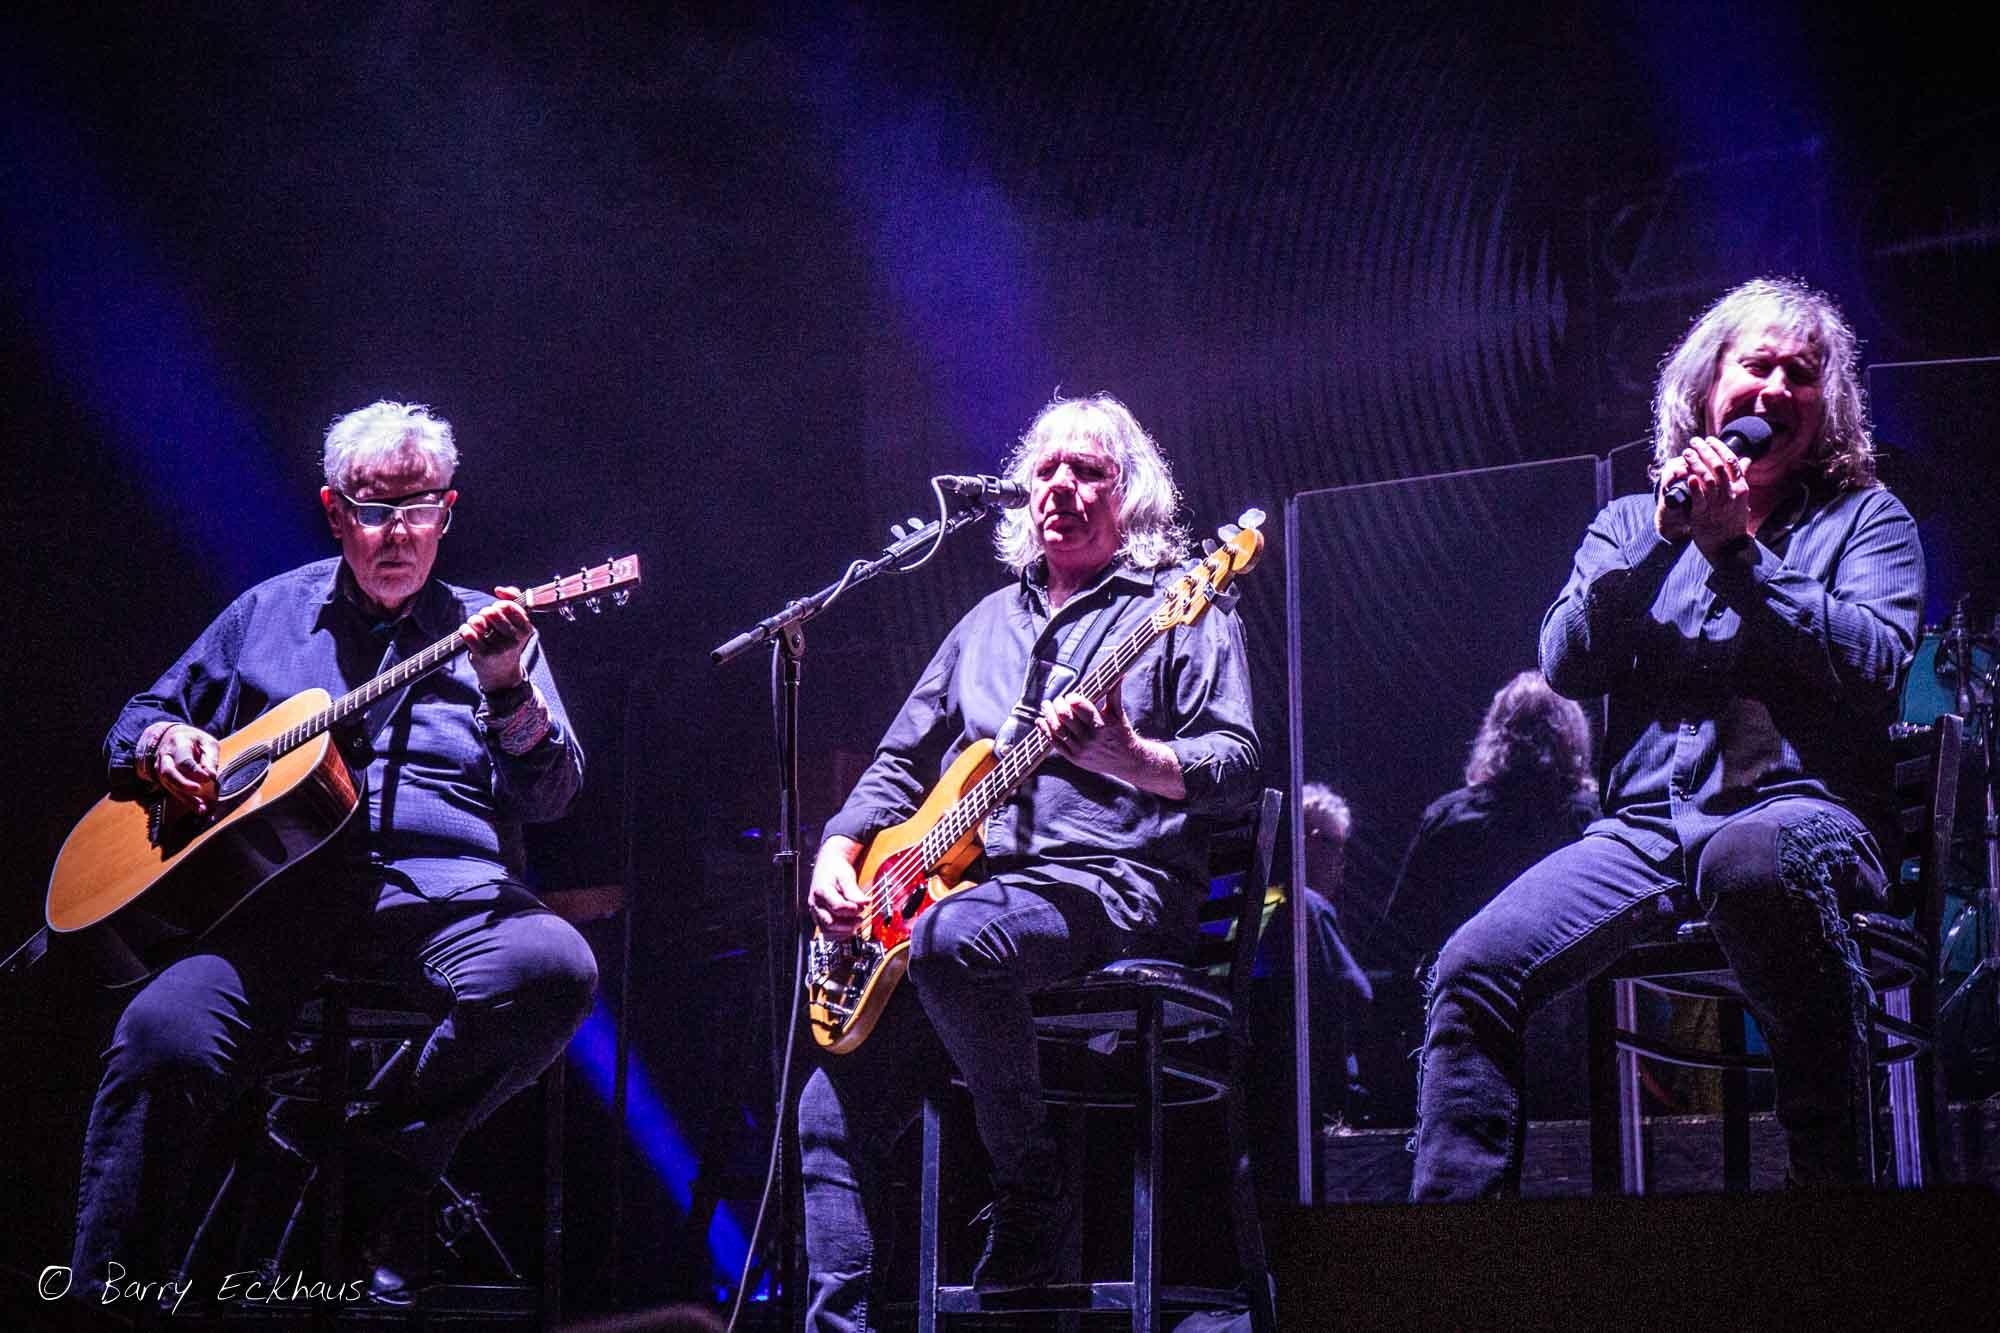 Concert photography of the band Kansas, Beaver Creek, Colorado.